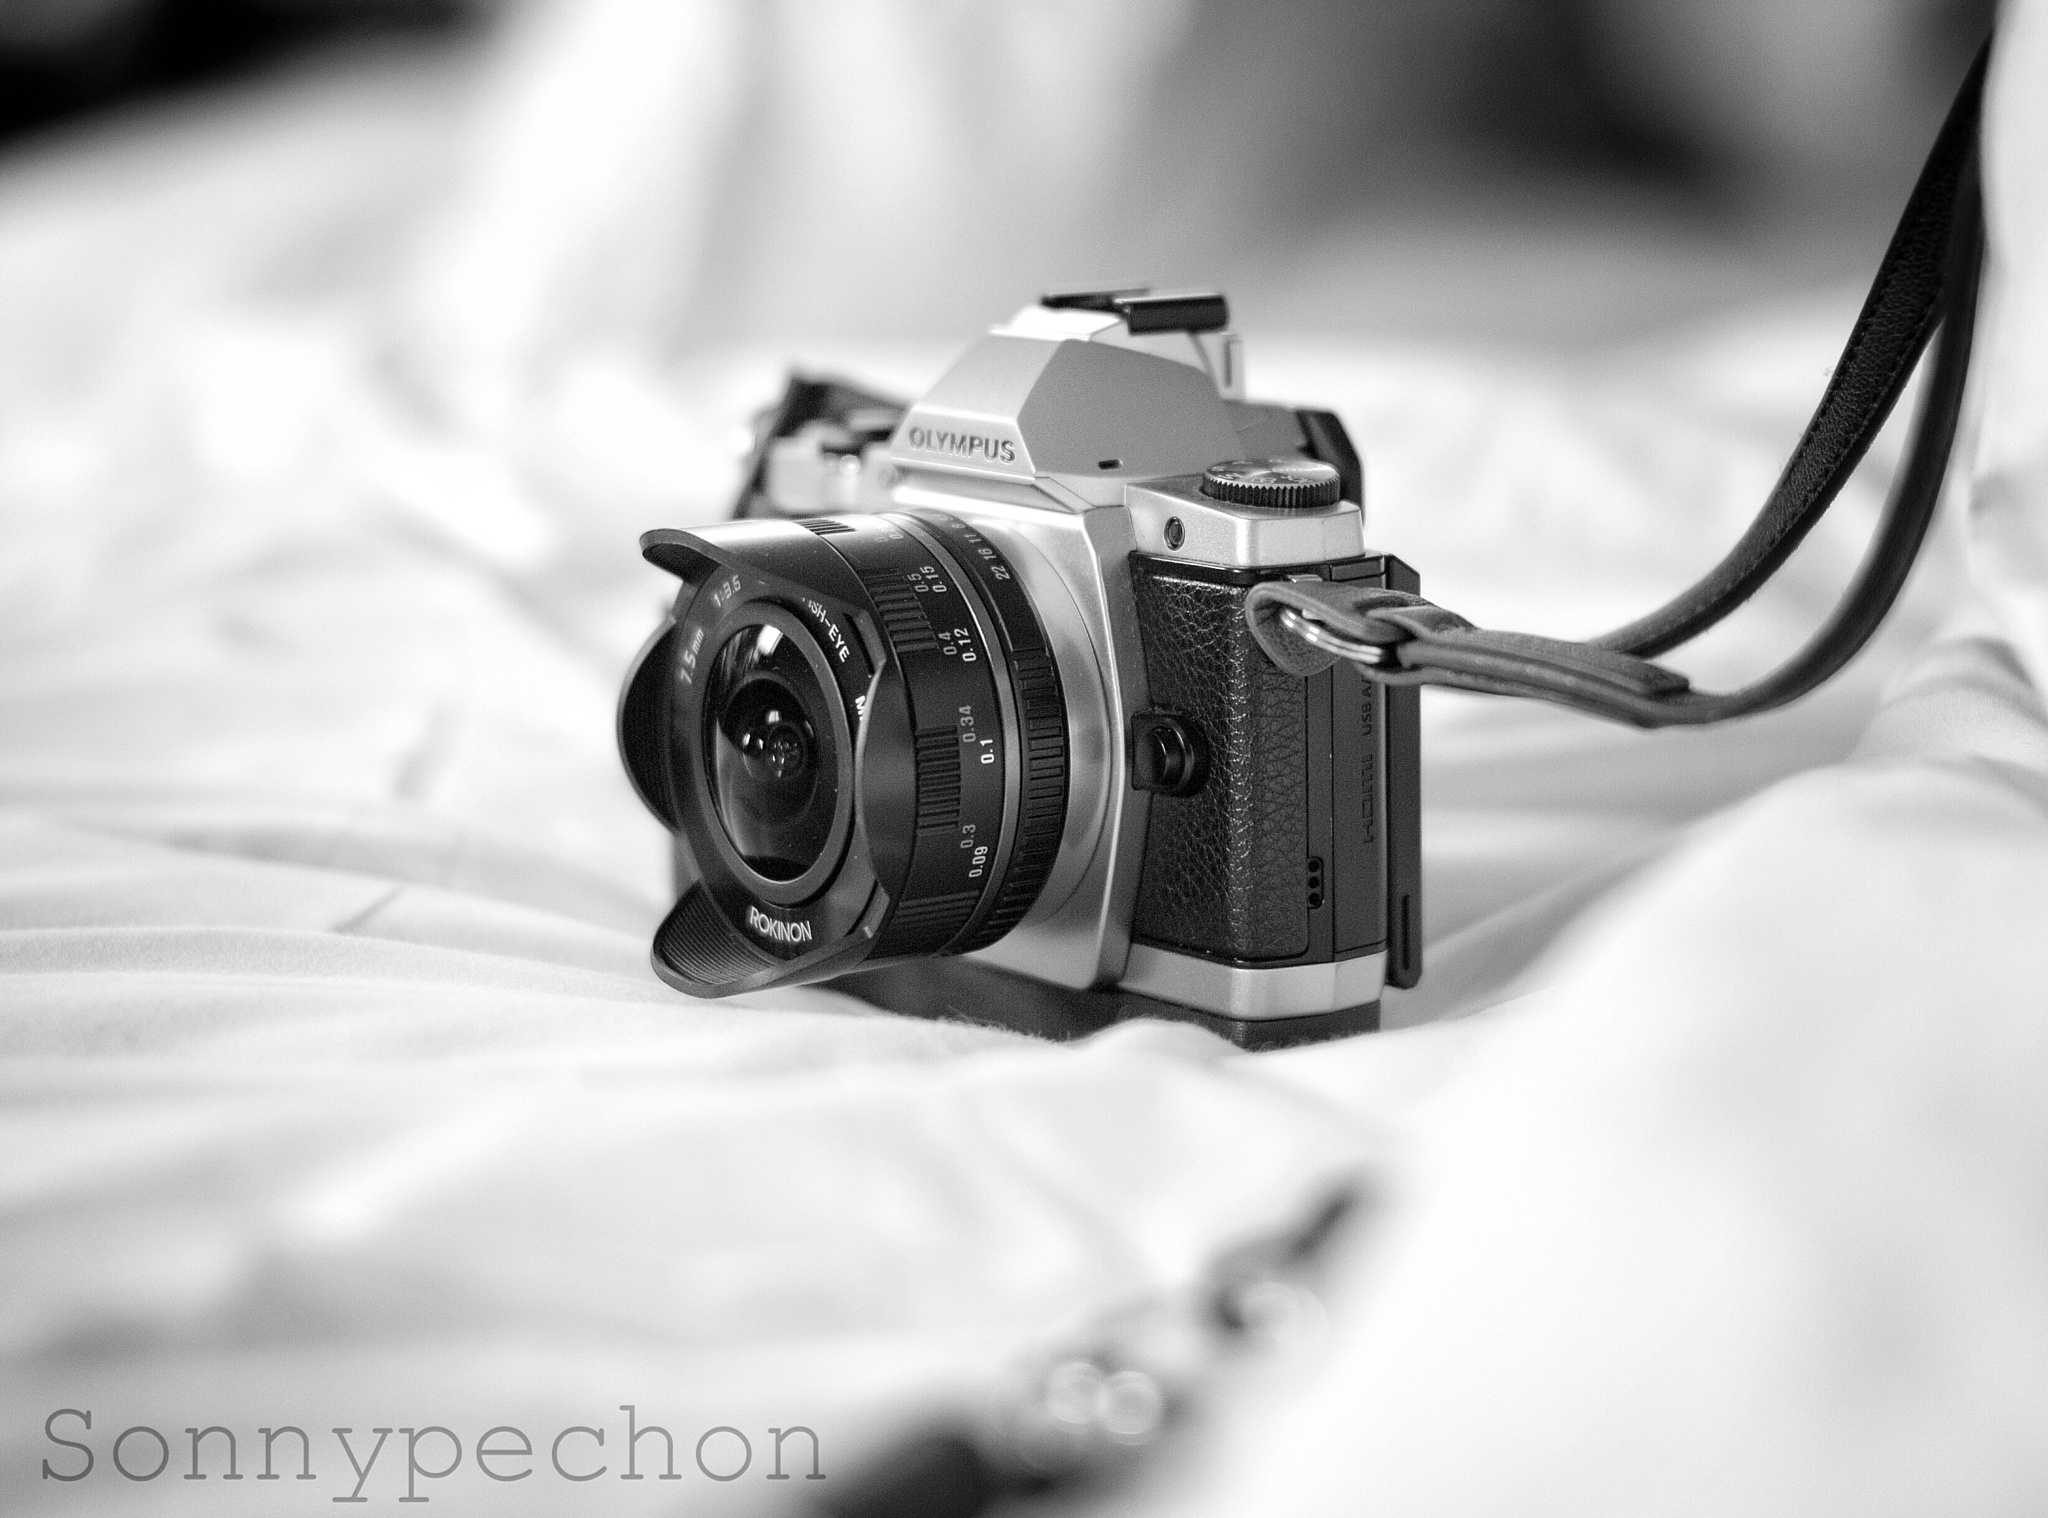 Little fella - camera porn by Sonny Pechon